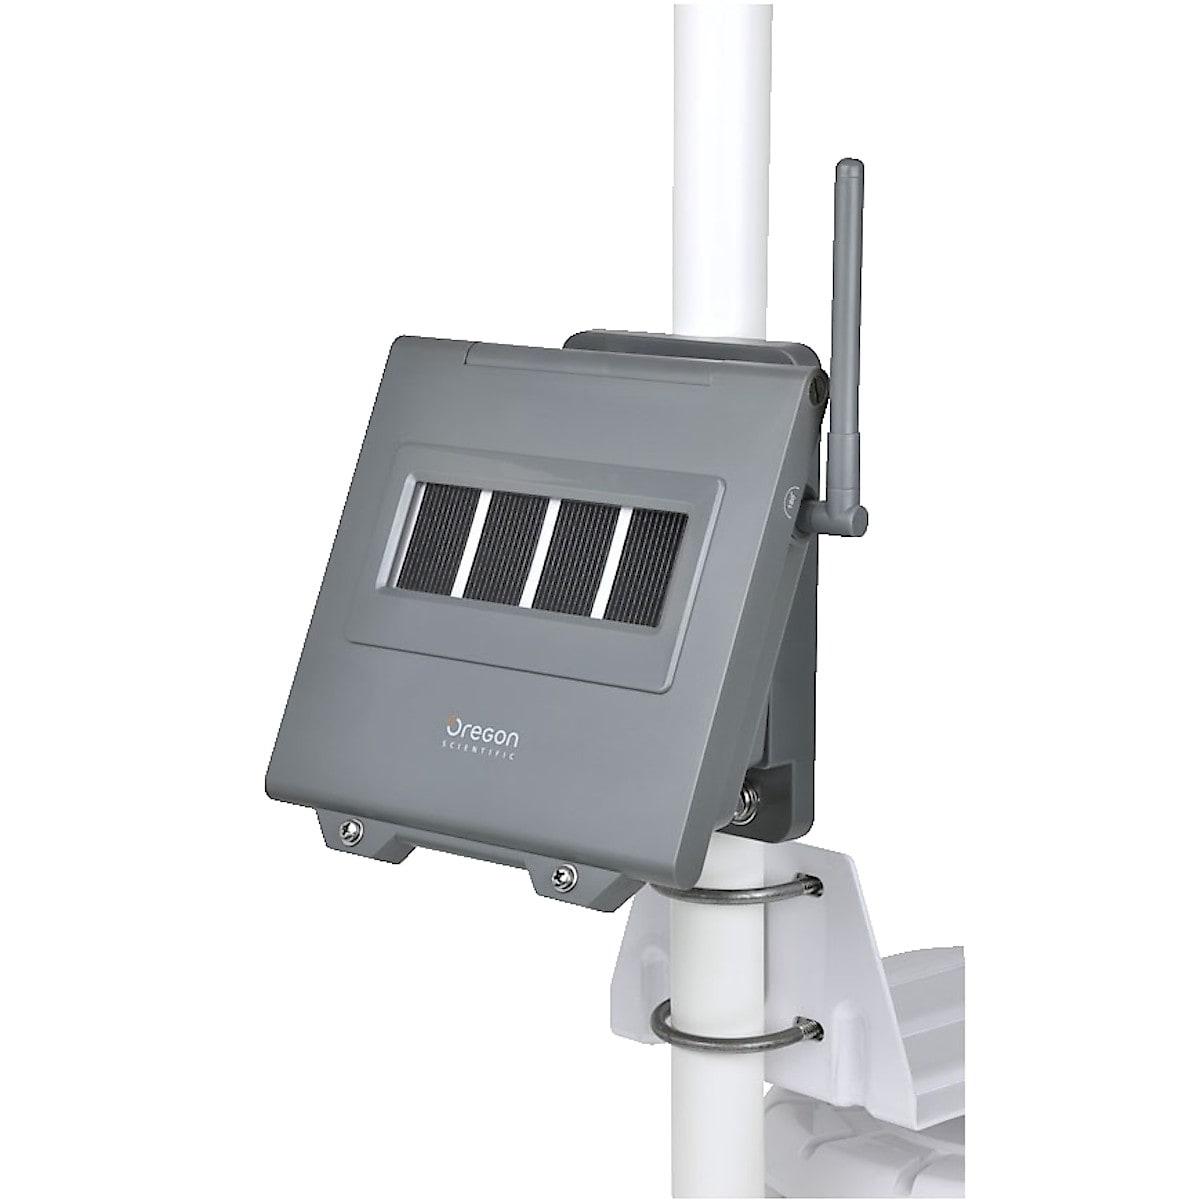 Extra temperaturgivare/hygrometer THGN301